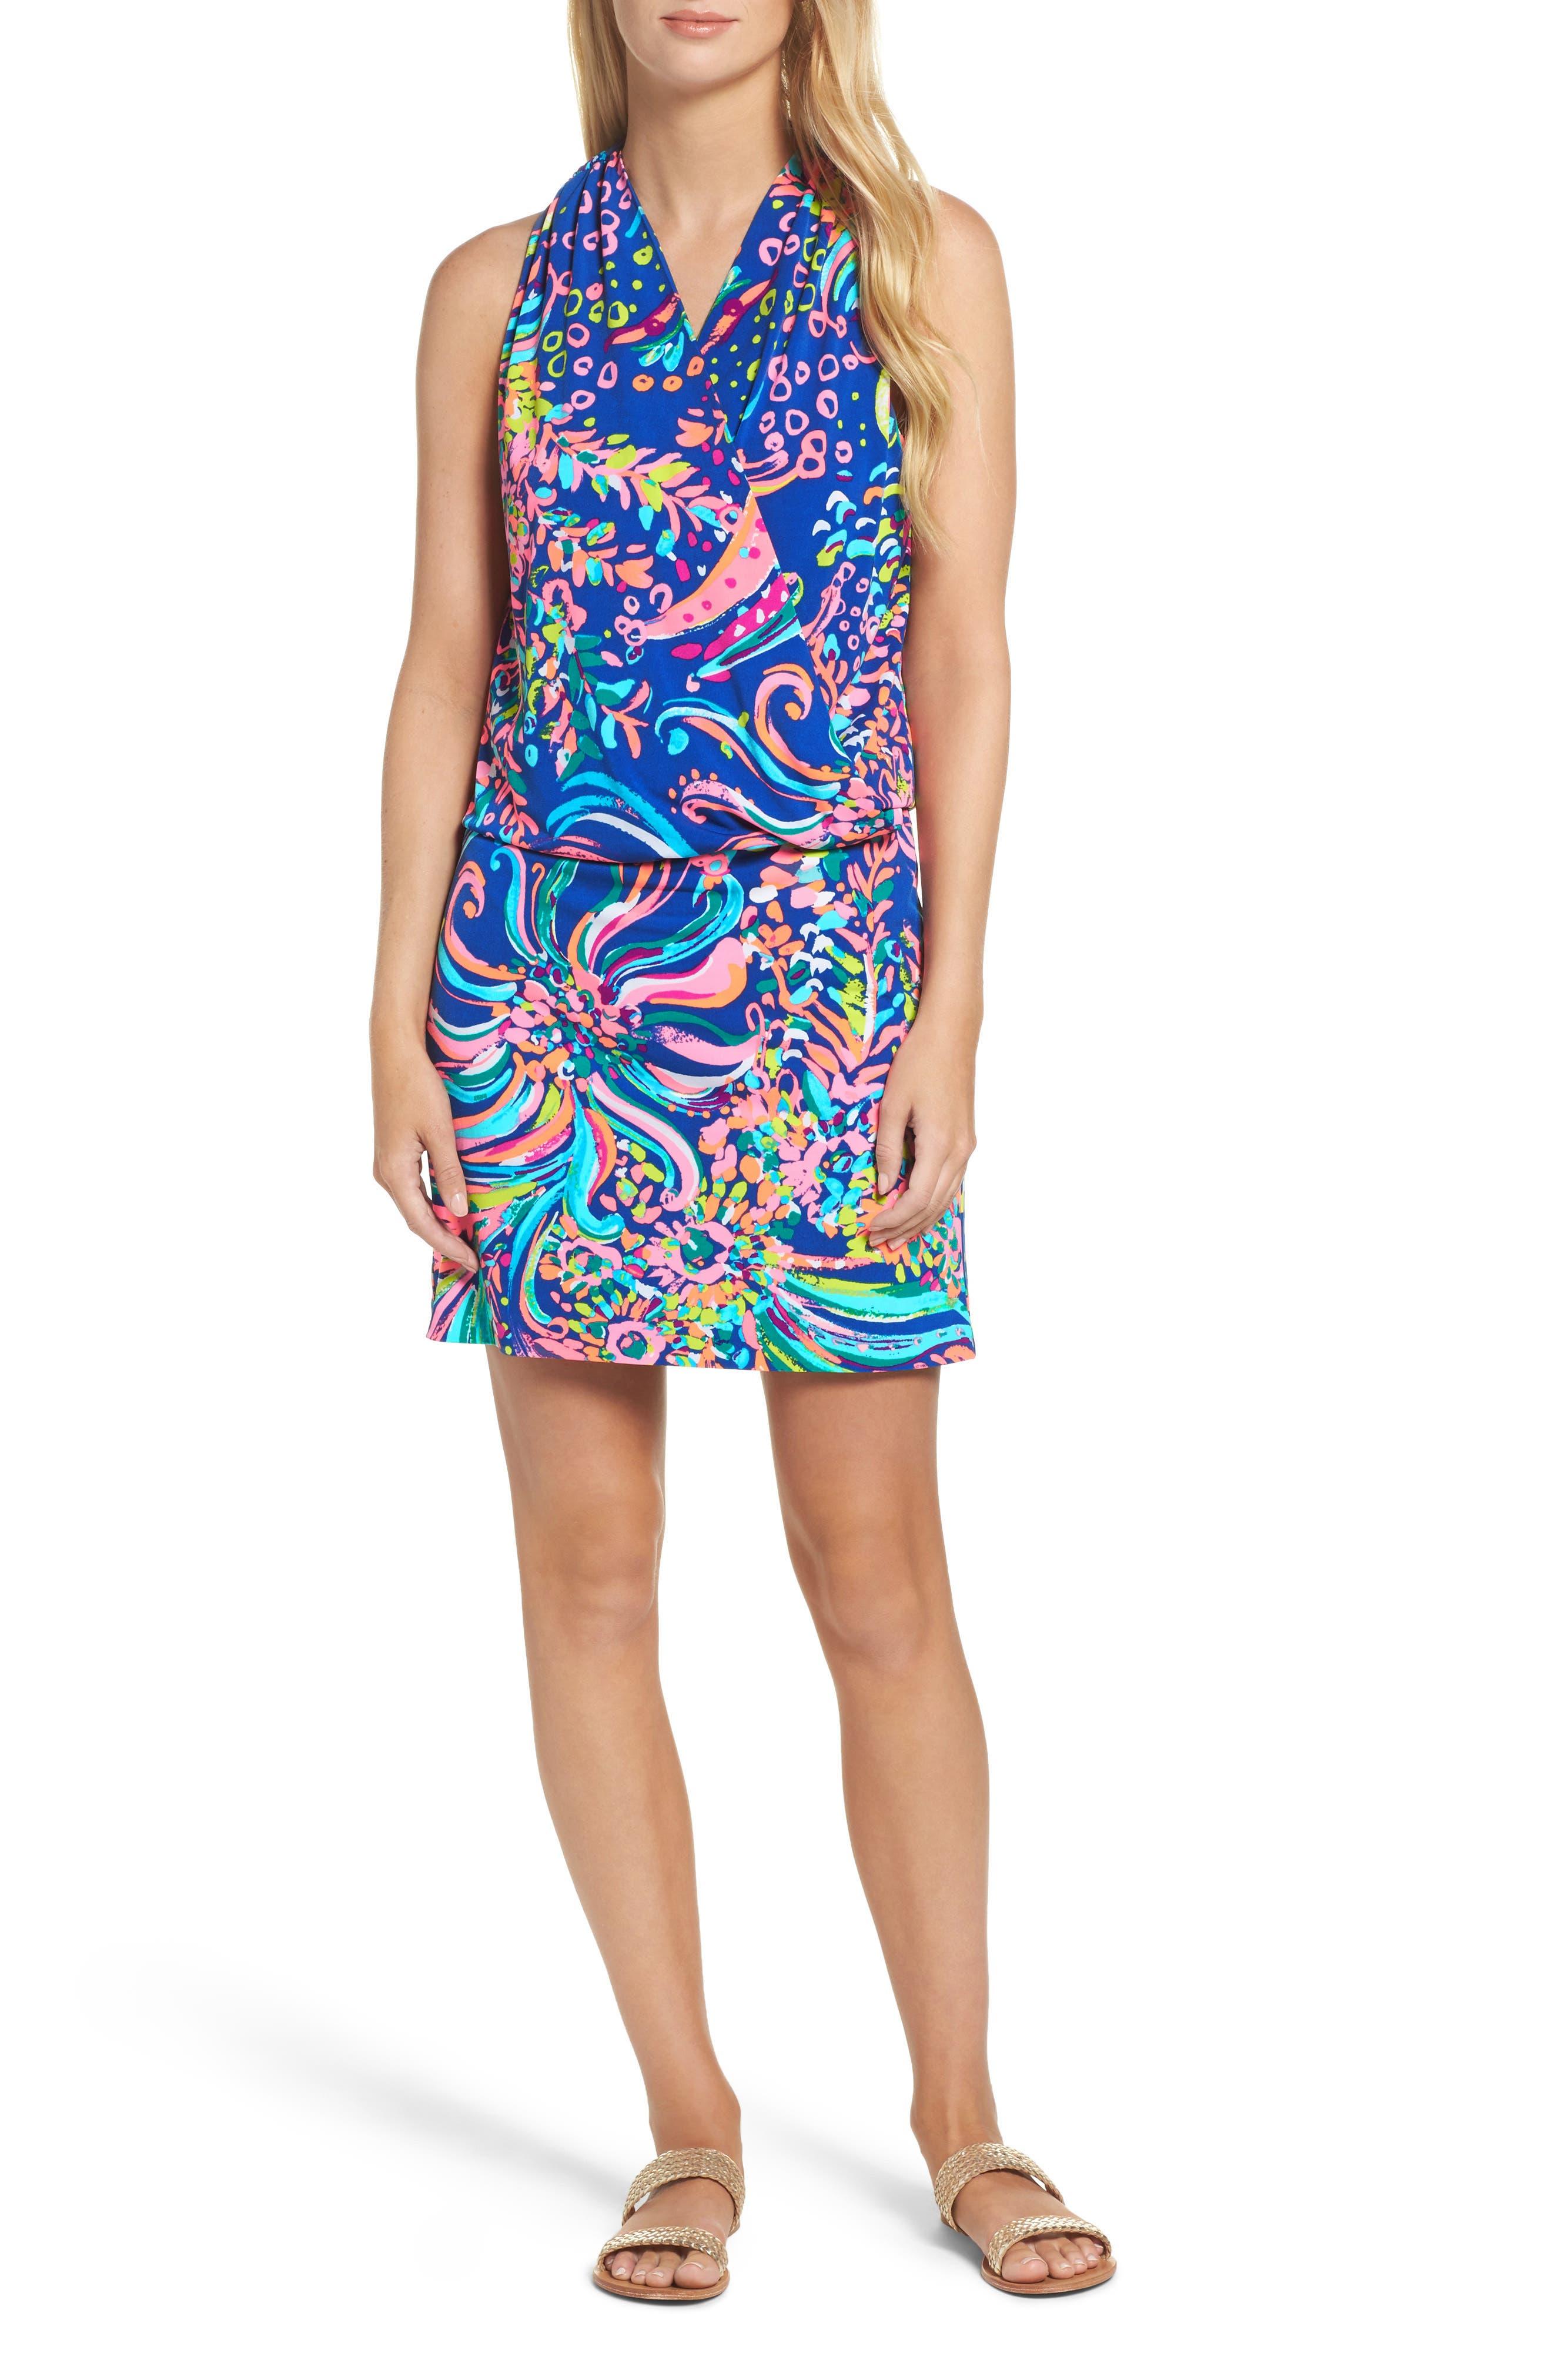 Main Image - Lilly Pulitzer® Felizia Blouson Dress